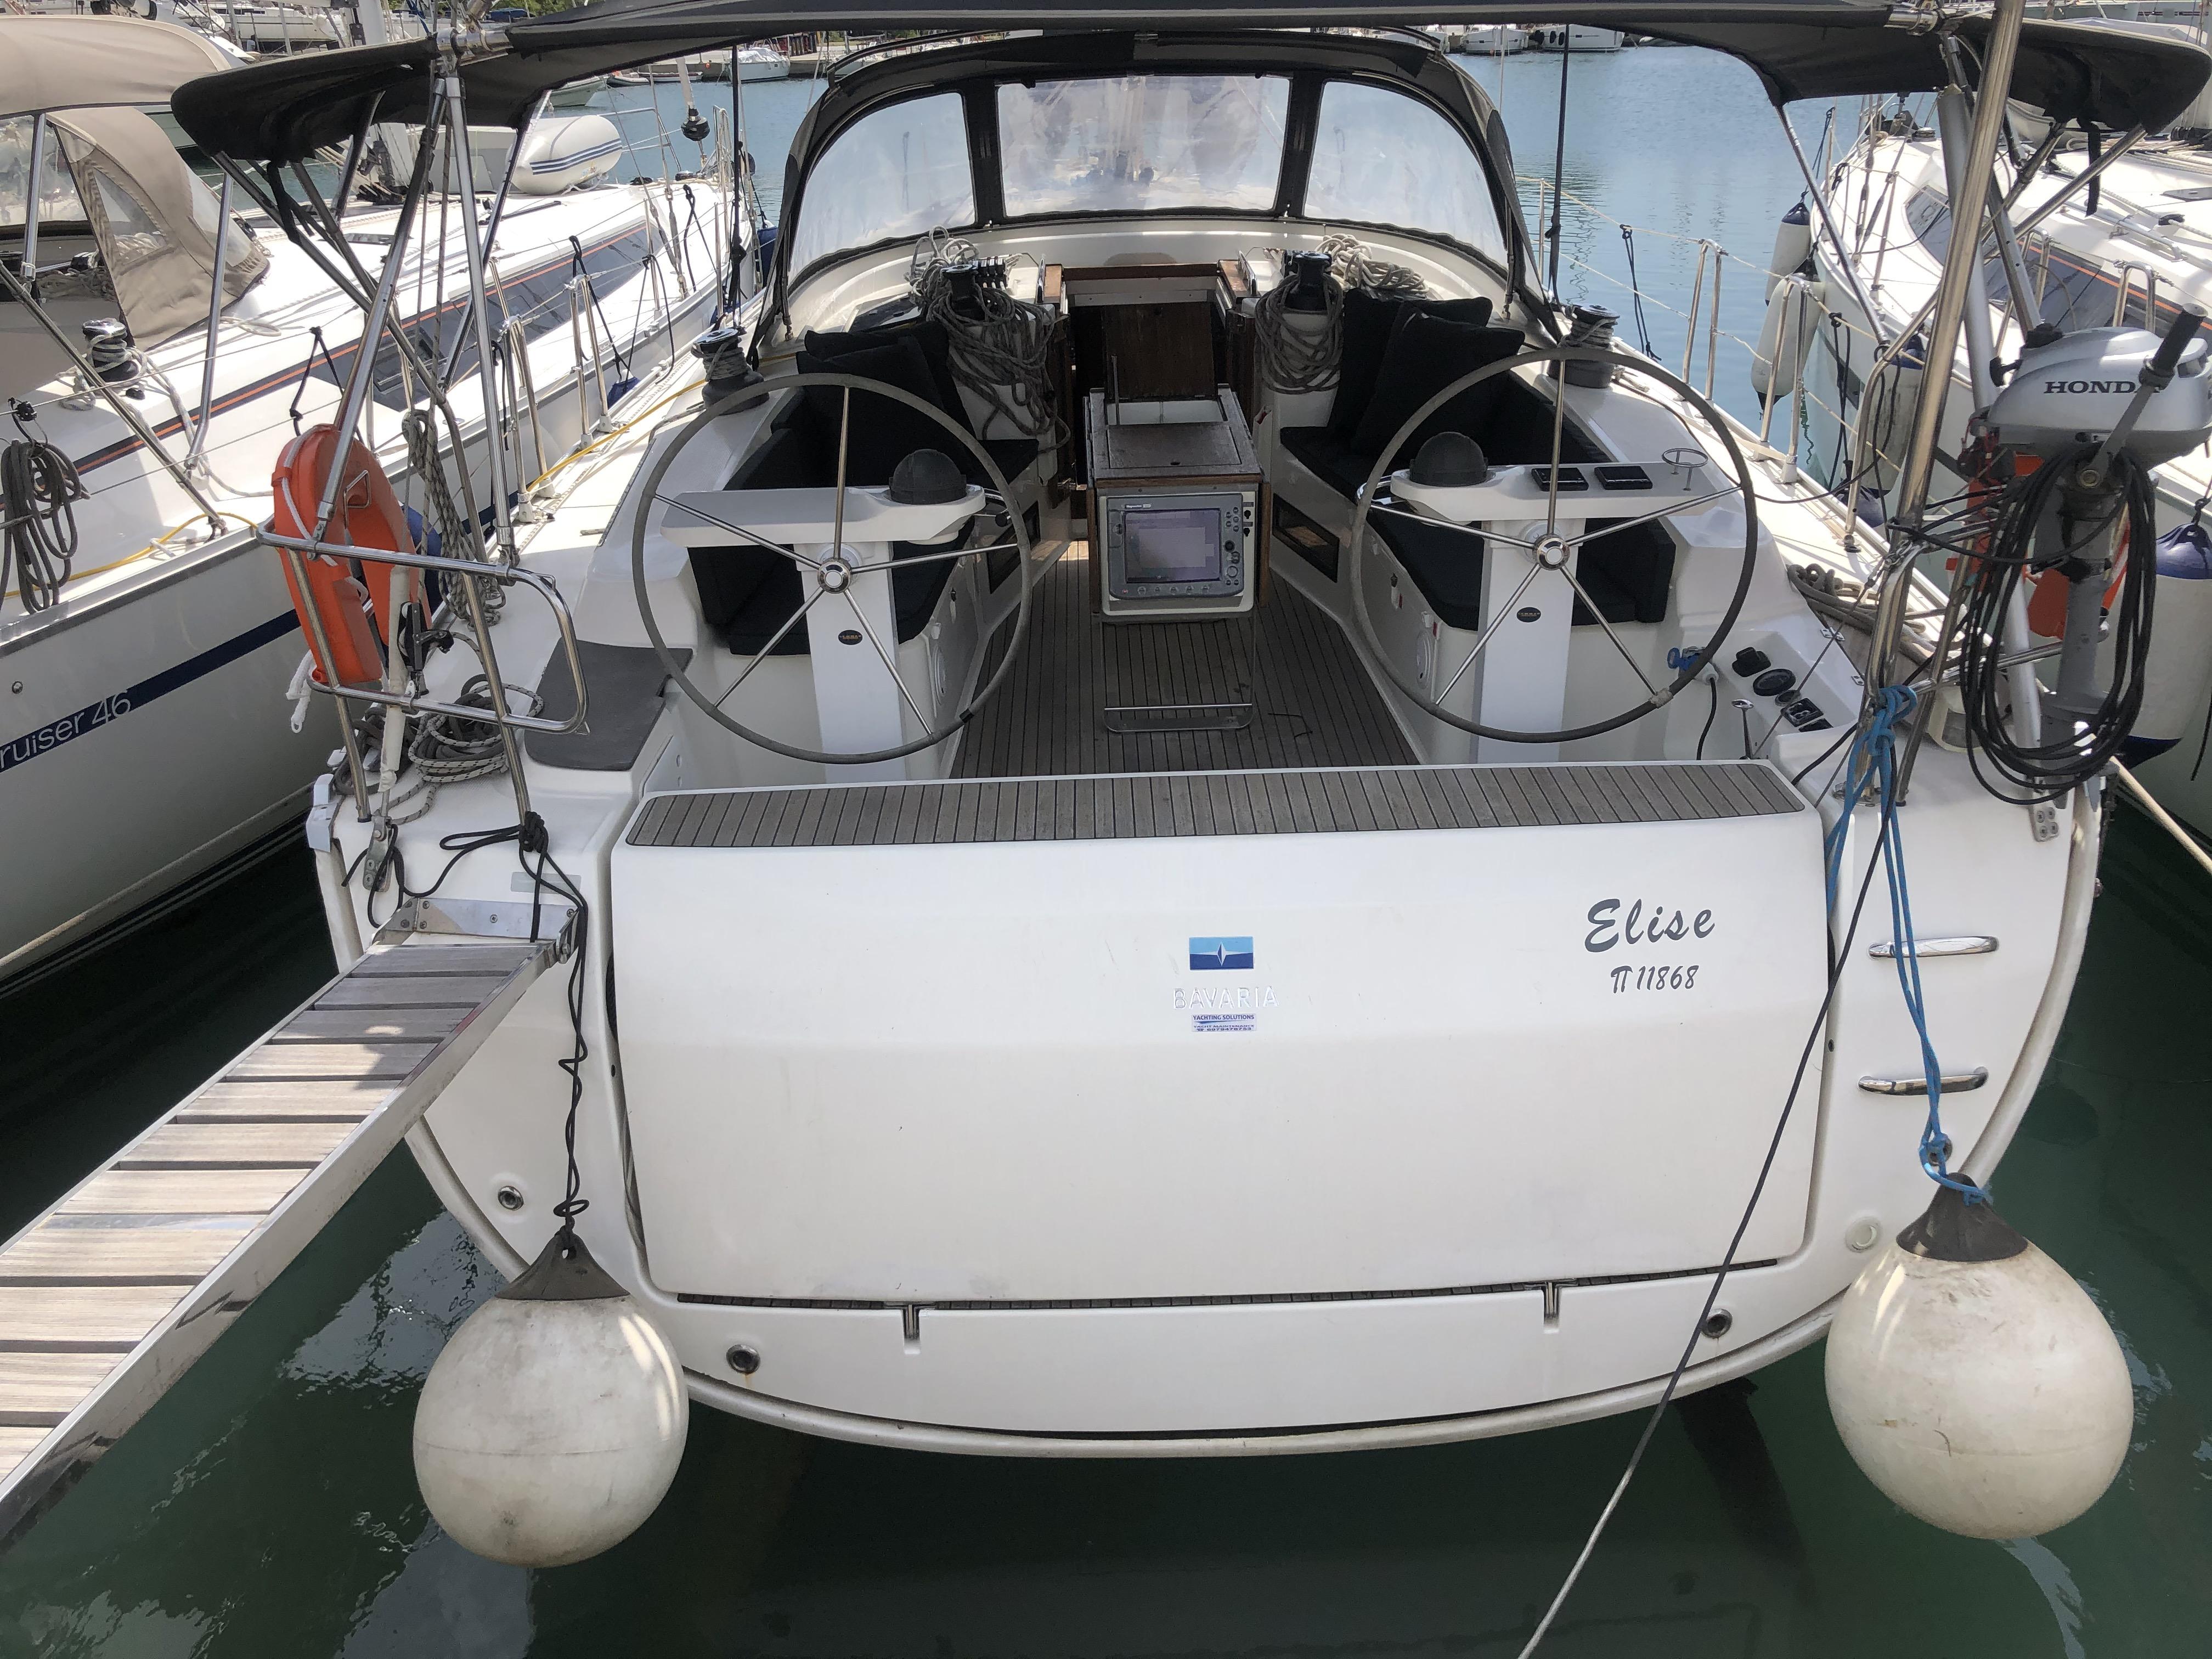 Bavaria Cruiser 45 (Elise -Bavaria 45 Cruiser)  - 5